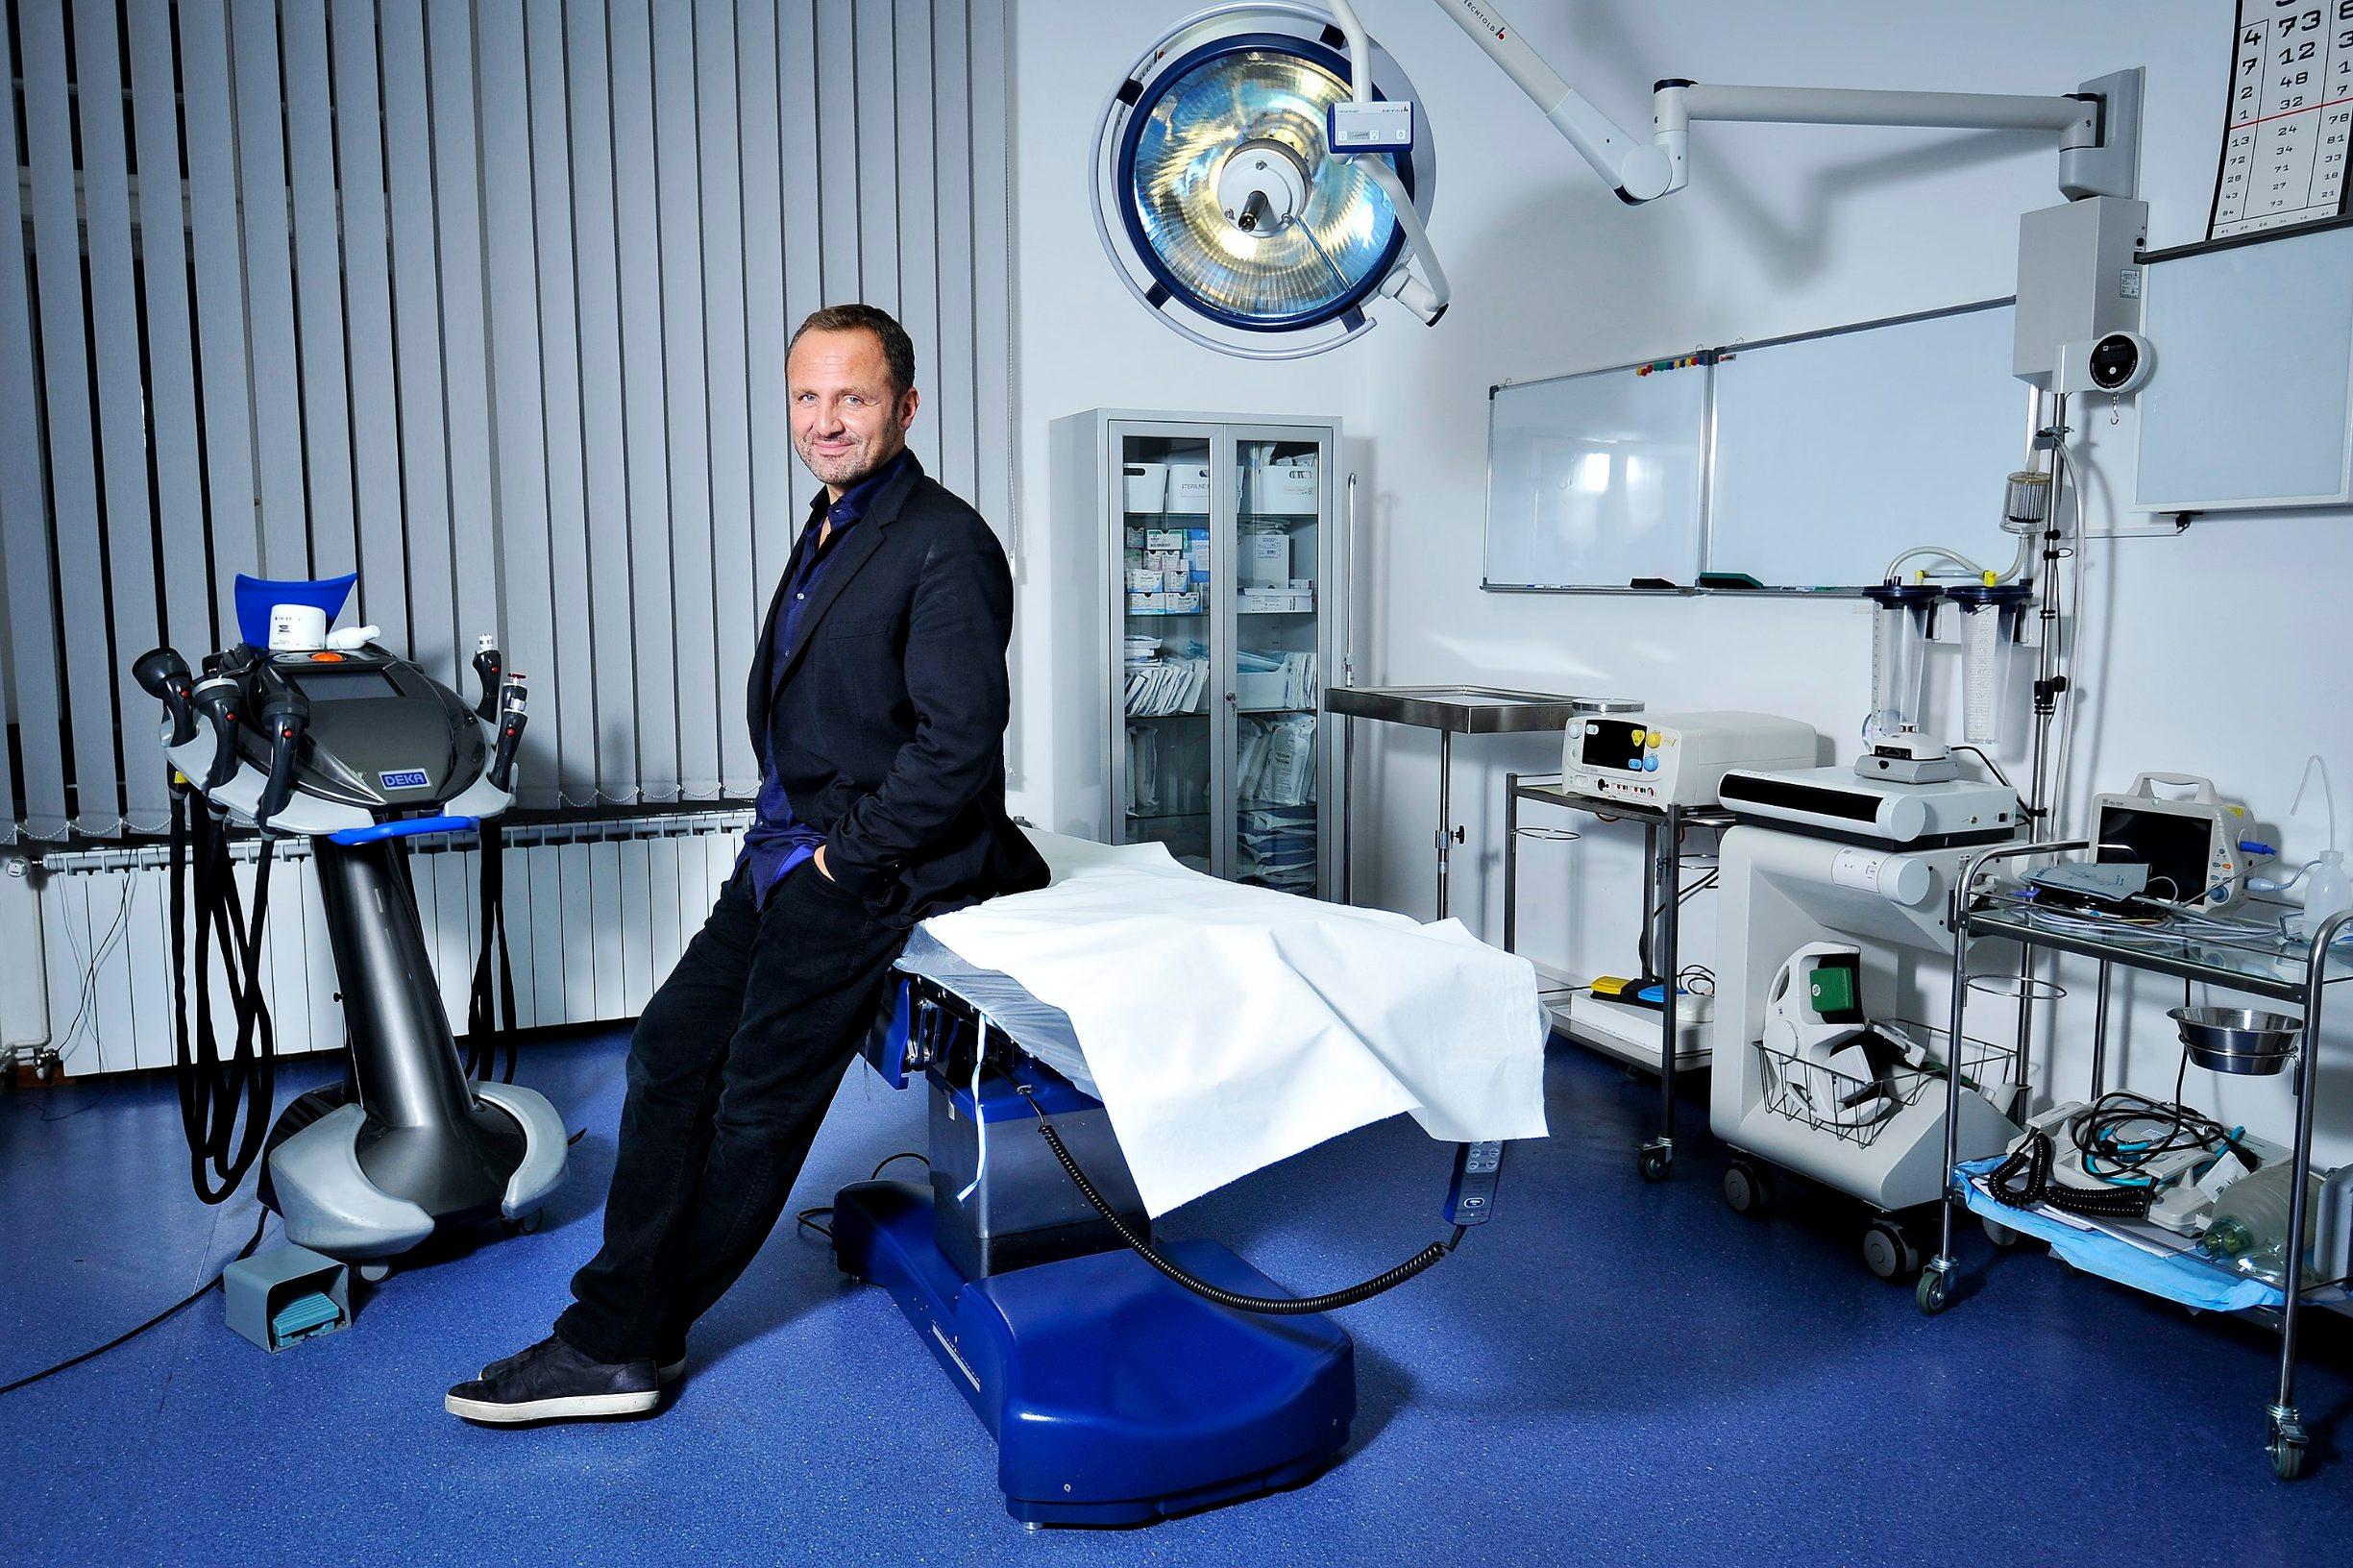 Zagreb, 011015.    Estetski kirurg Nikola Milojevic, fotografiran u svojoj ordinaciji.